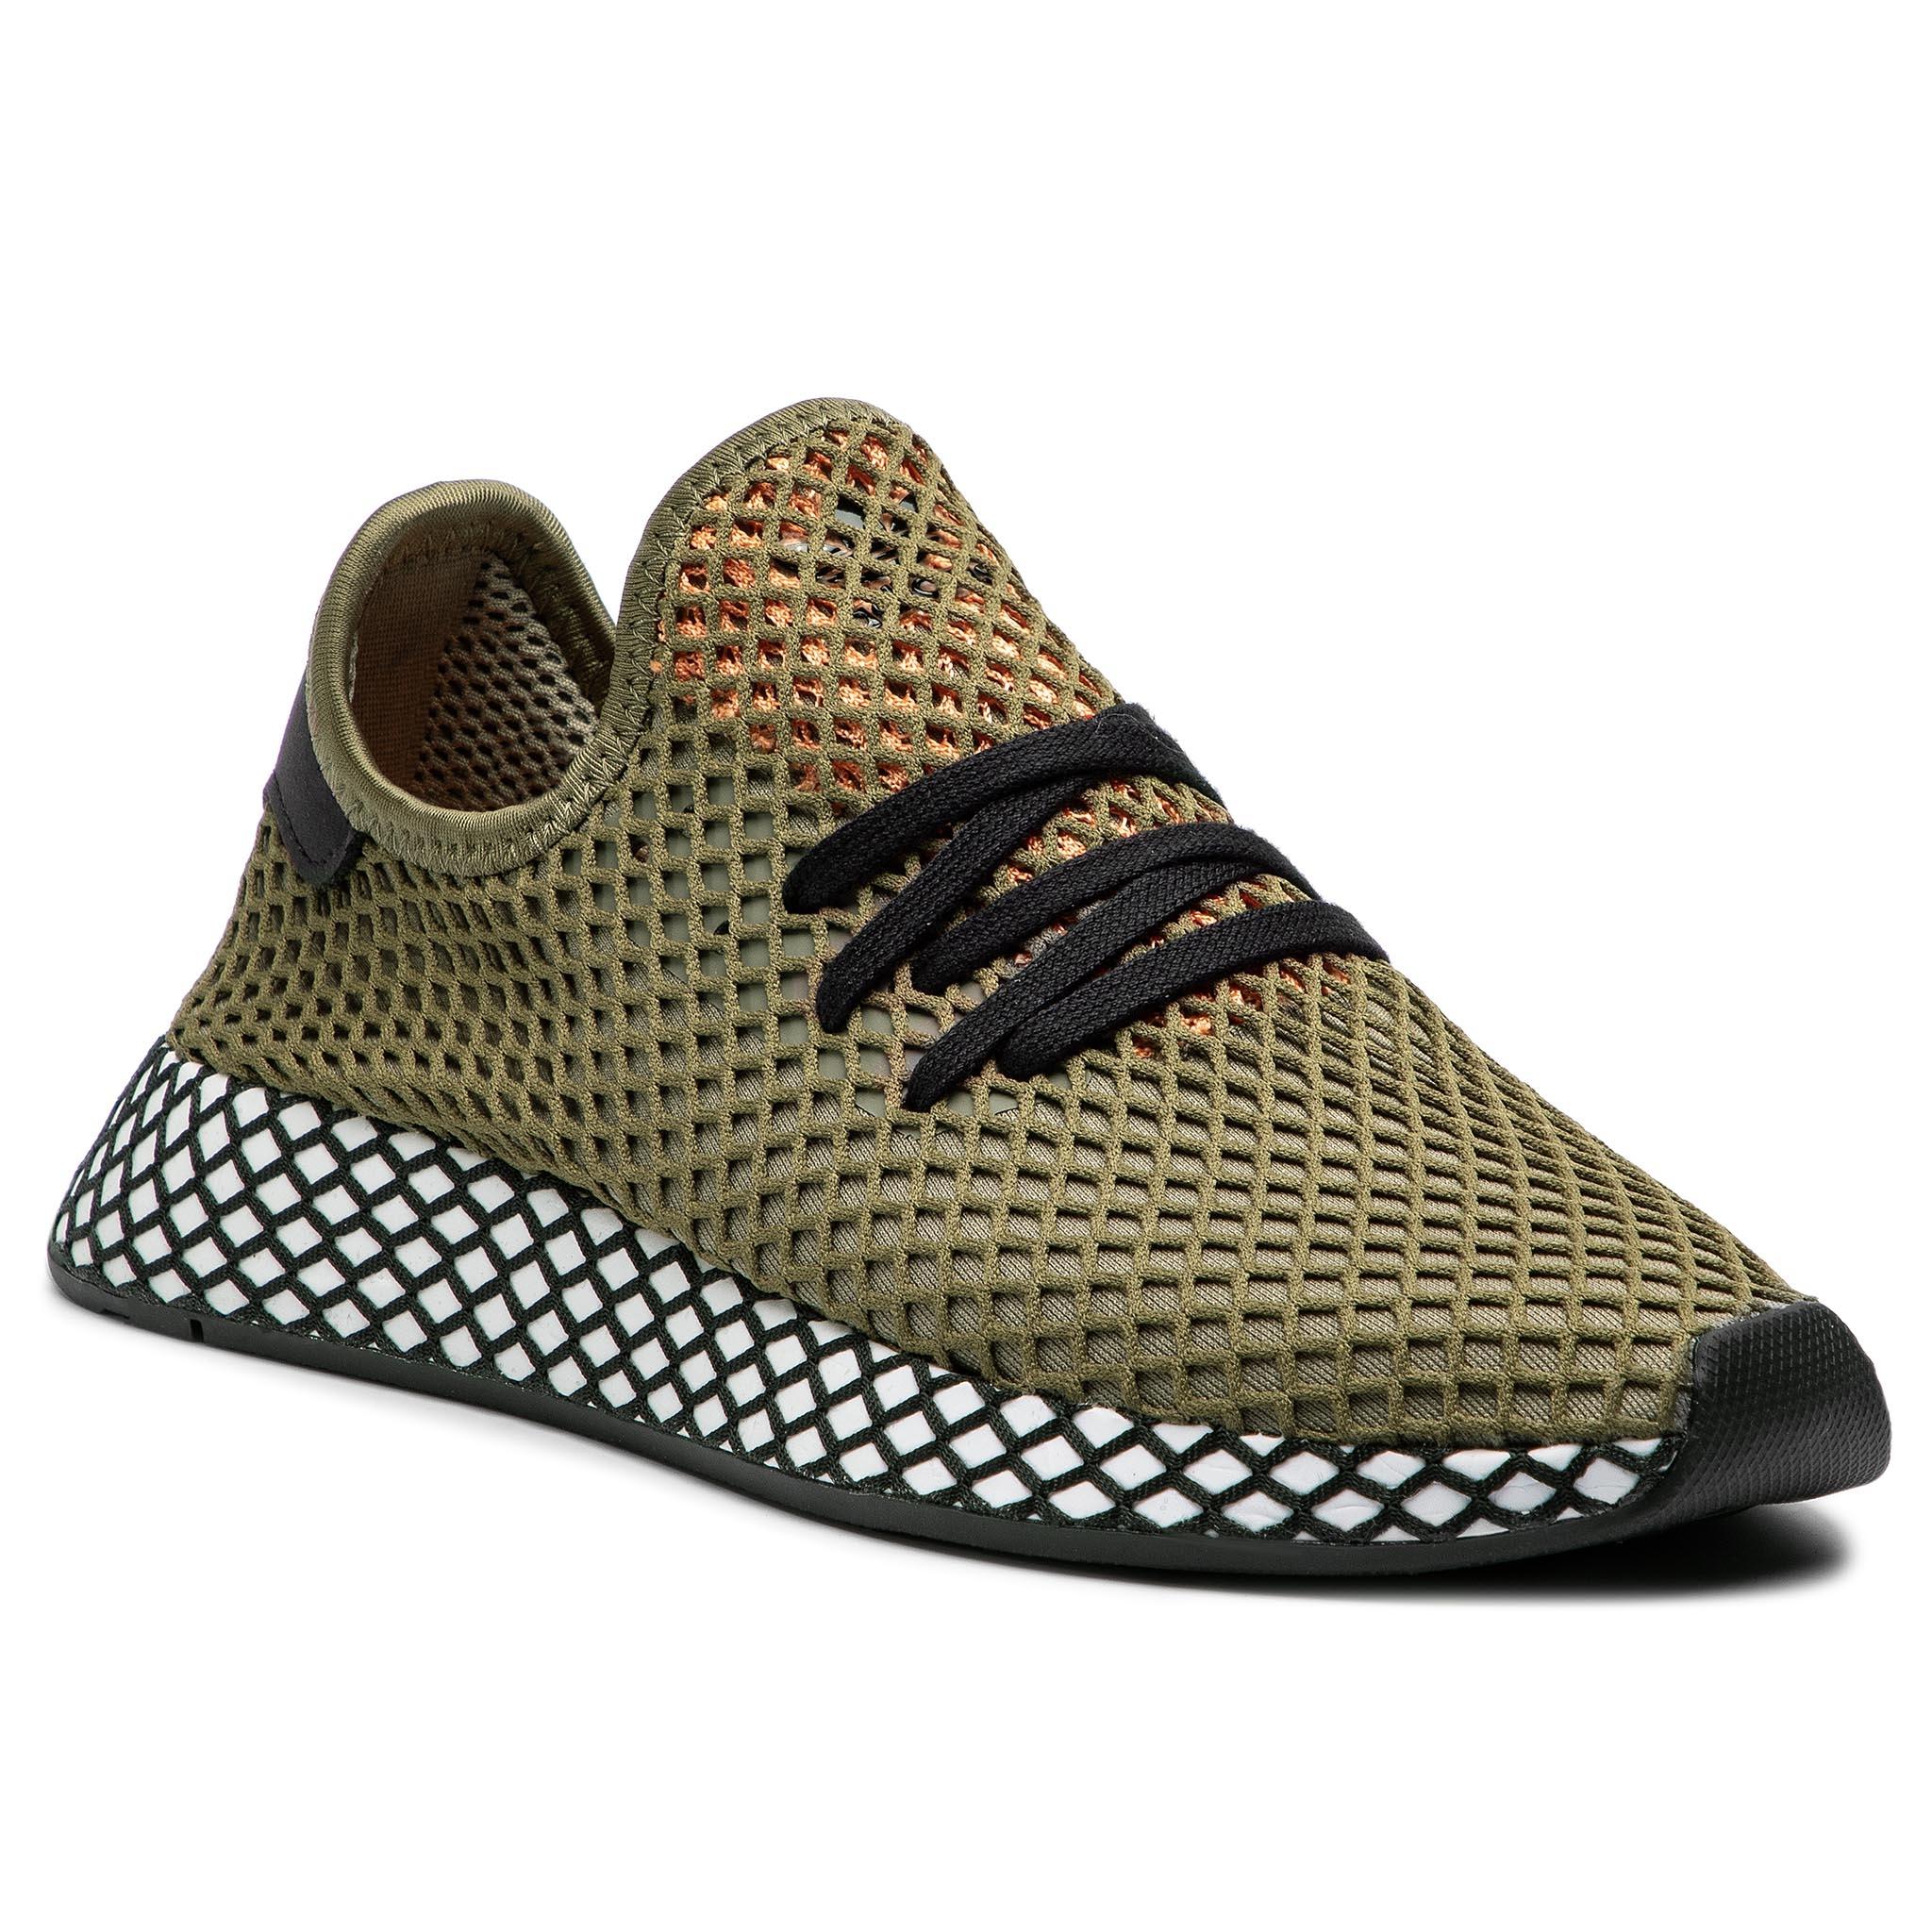 14afb6c0c63 Παπούτσια adidas - Deerupt Runner BD7894 Rawkha/Cblack/Easora - Glami.gr